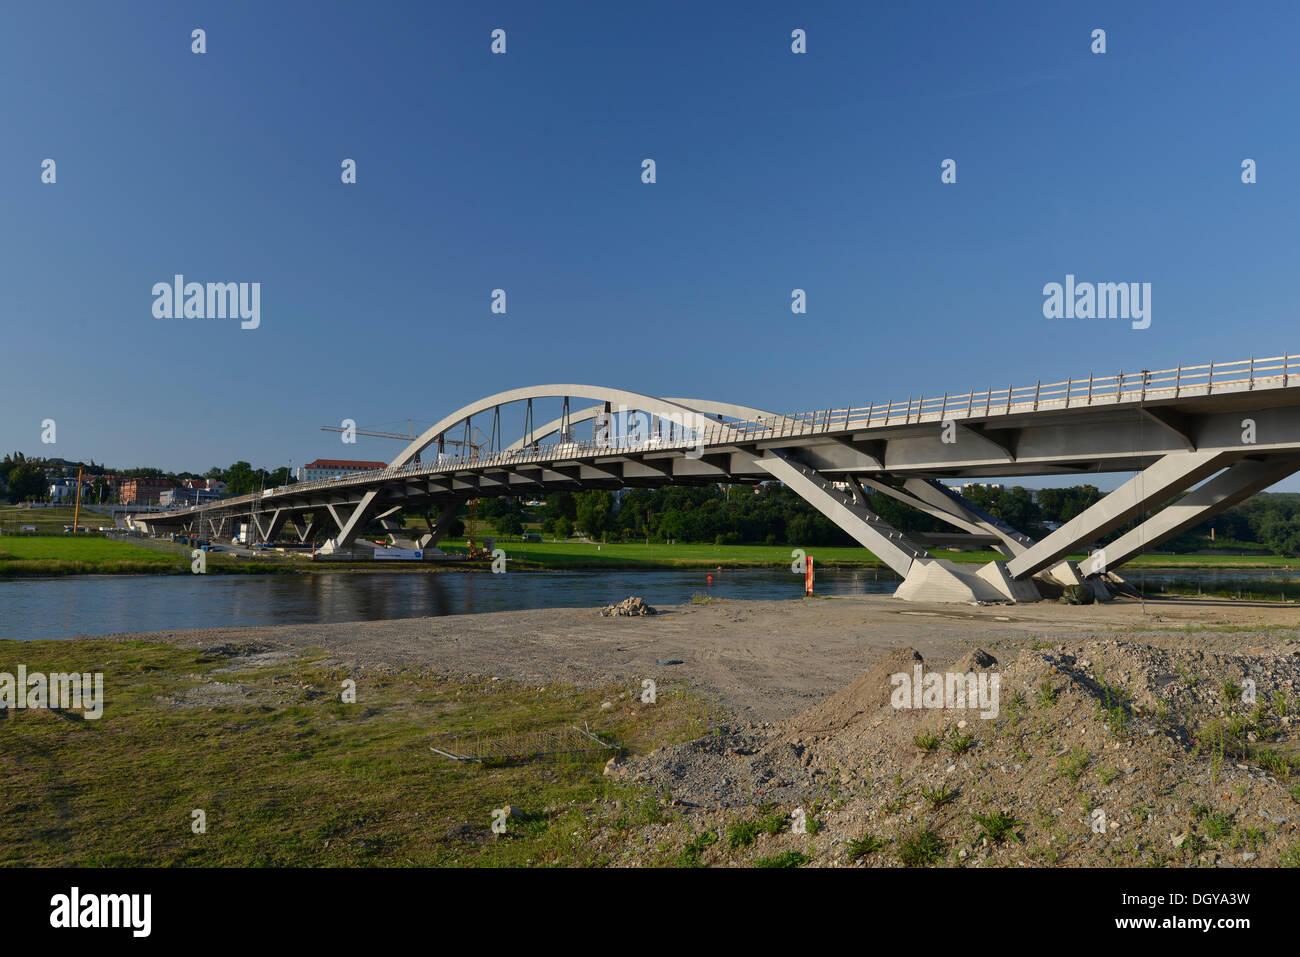 Neue Waldschloesschenbruecke Bridge, construction site of the controversial new Elbe river crossing, Dresden, Saxony - Stock Image